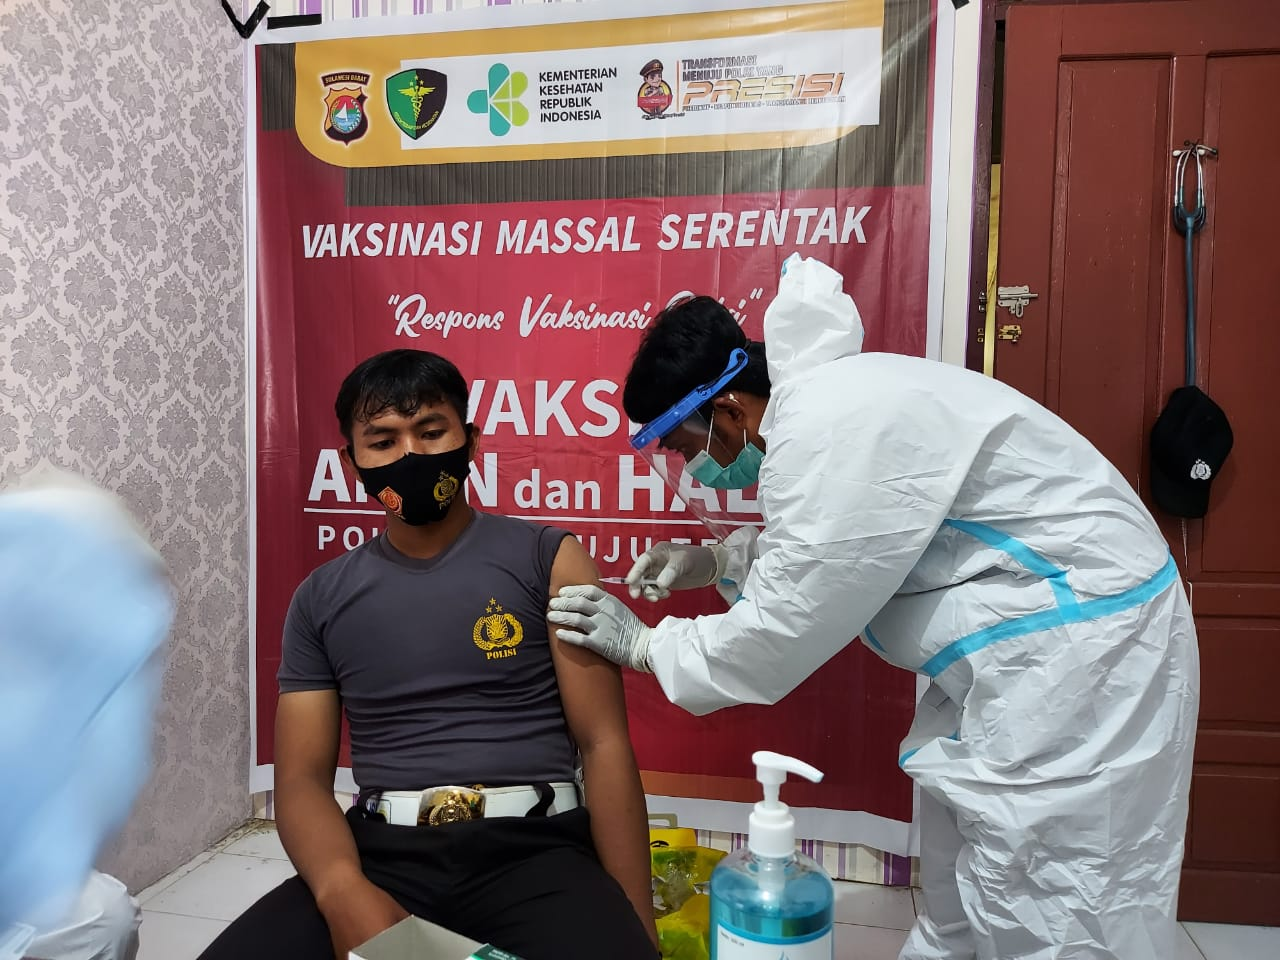 Polres Mamuju Tengah Gelar Vaksinasi Massal Serentak